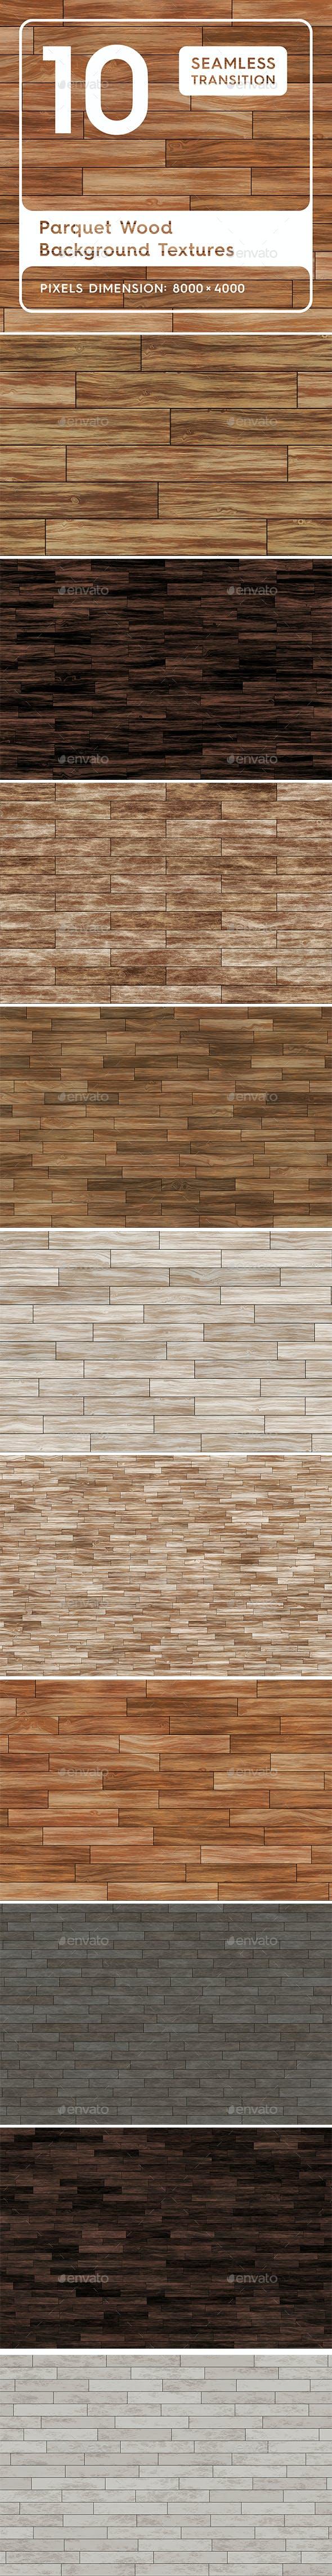 10 Parquet Wood Background Textures - 3DOcean Item for Sale